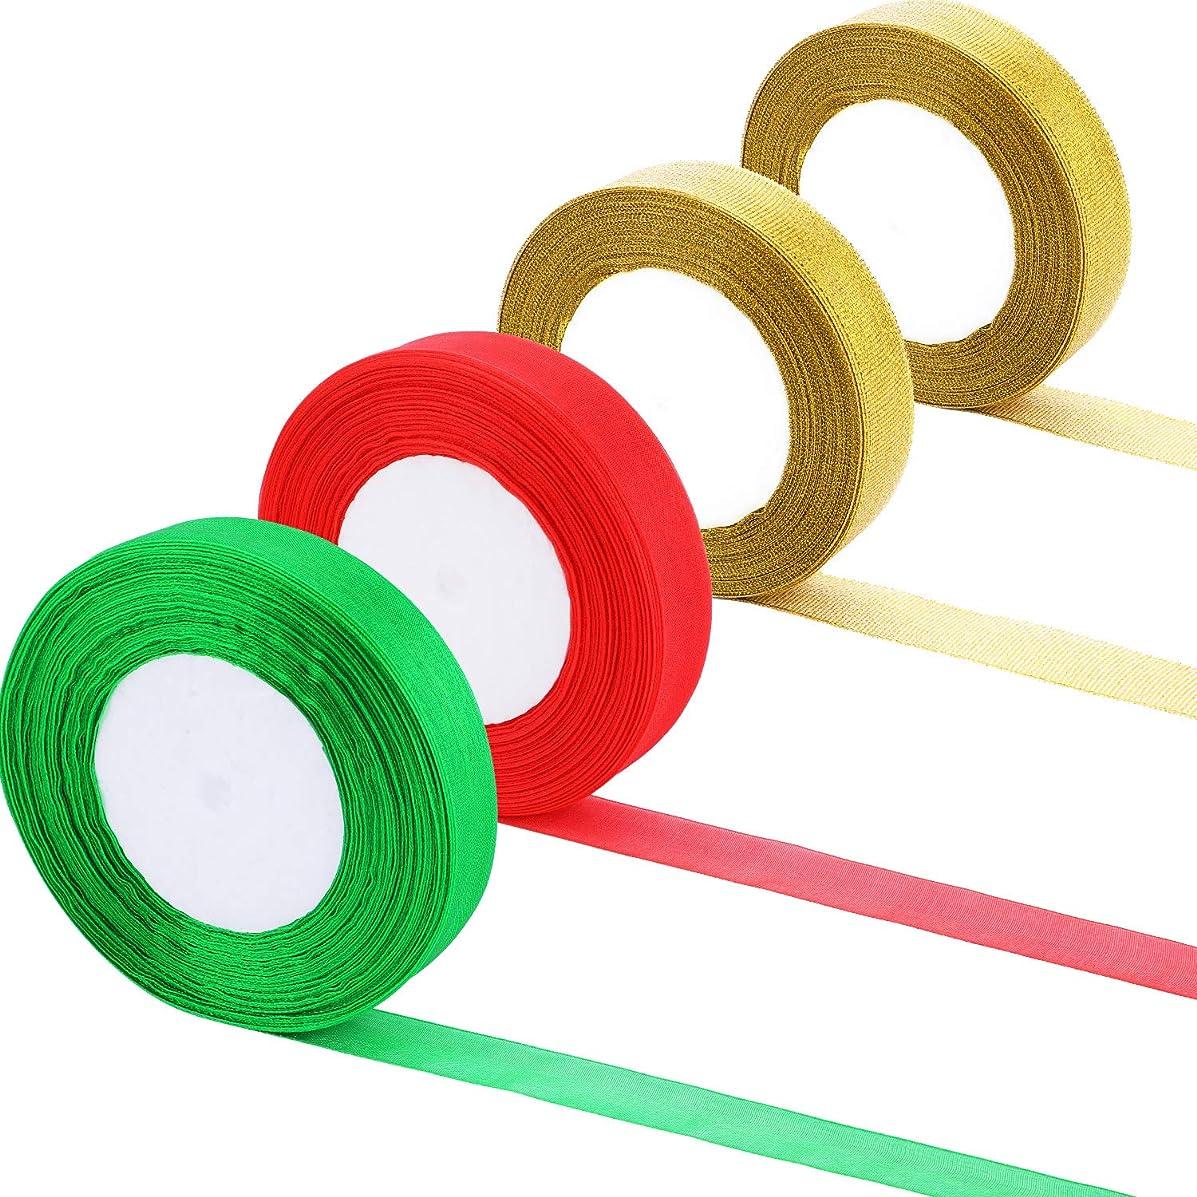 Patelai 4 Rolls 150 Yards Total 22 mm Wide Shimmer Sheer Organza Ribbons Shiny Organza Ribbon for Christmas DIY Decoration, 3 Colors